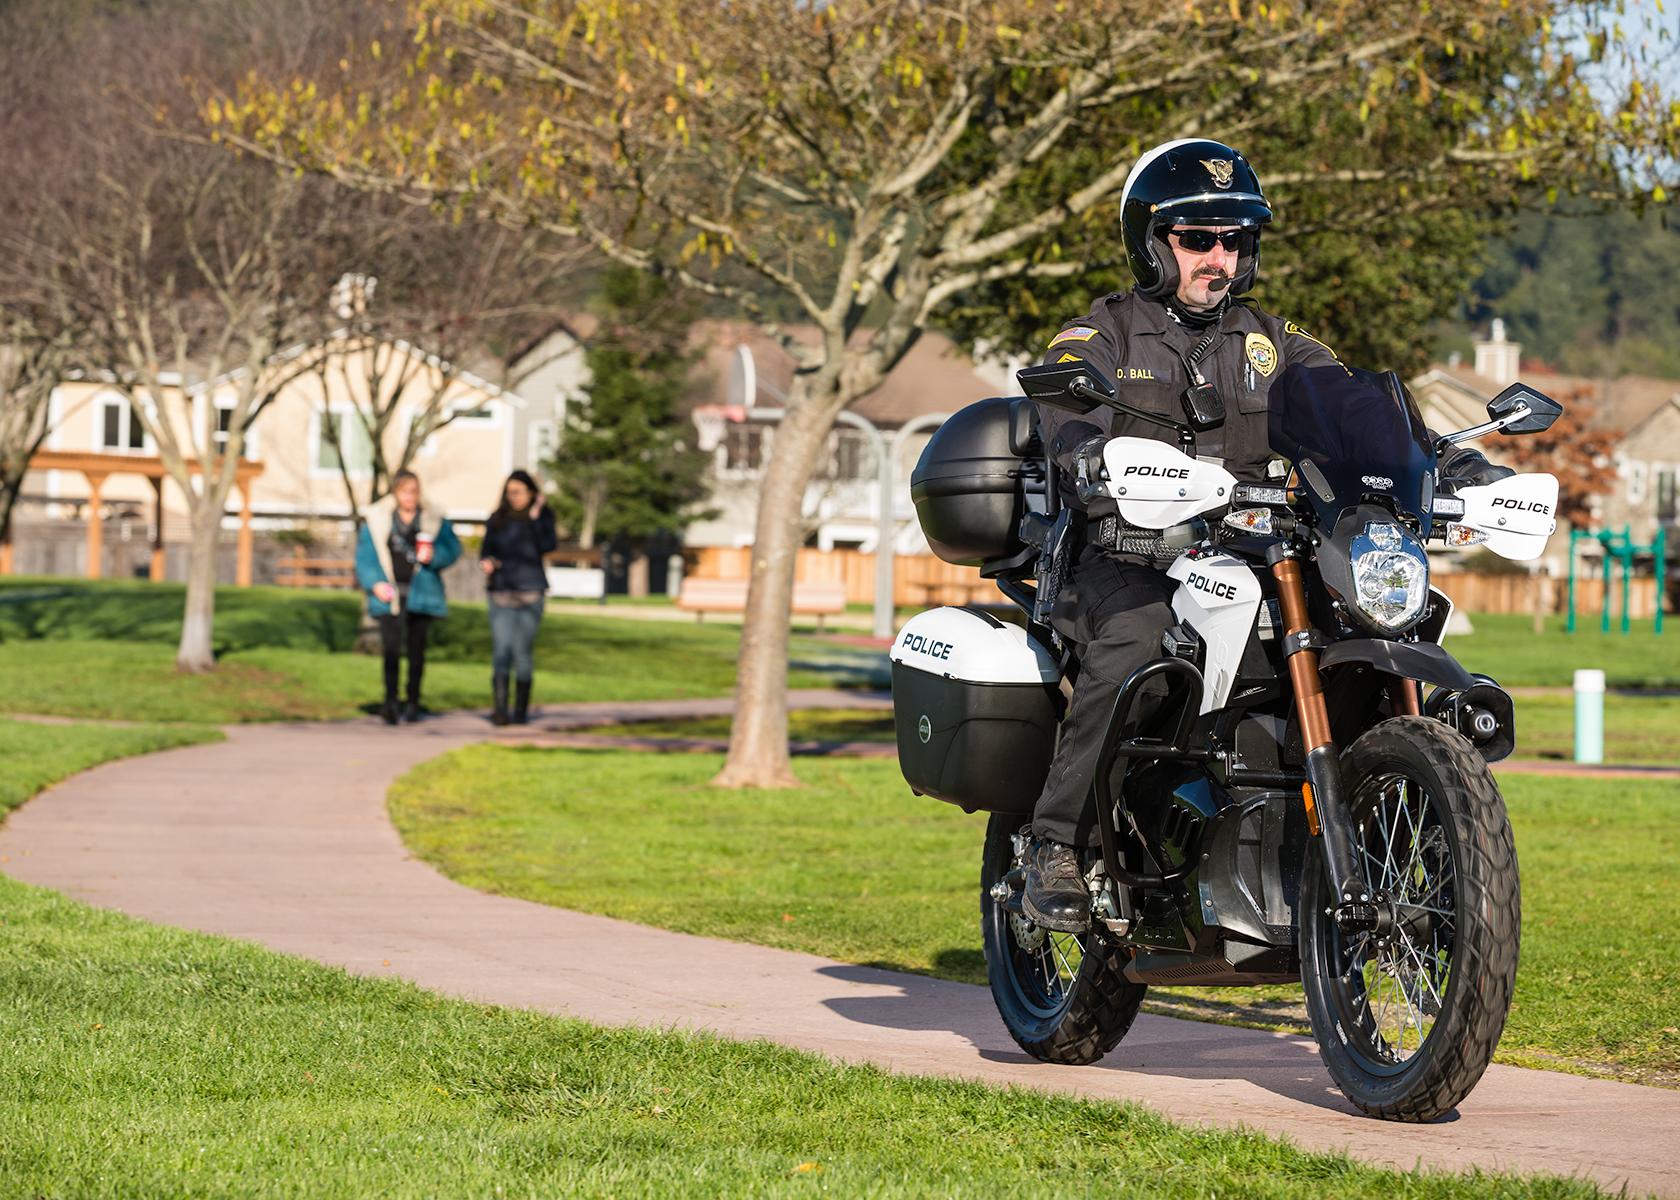 2013 Zero Police Electric Motorcycle: